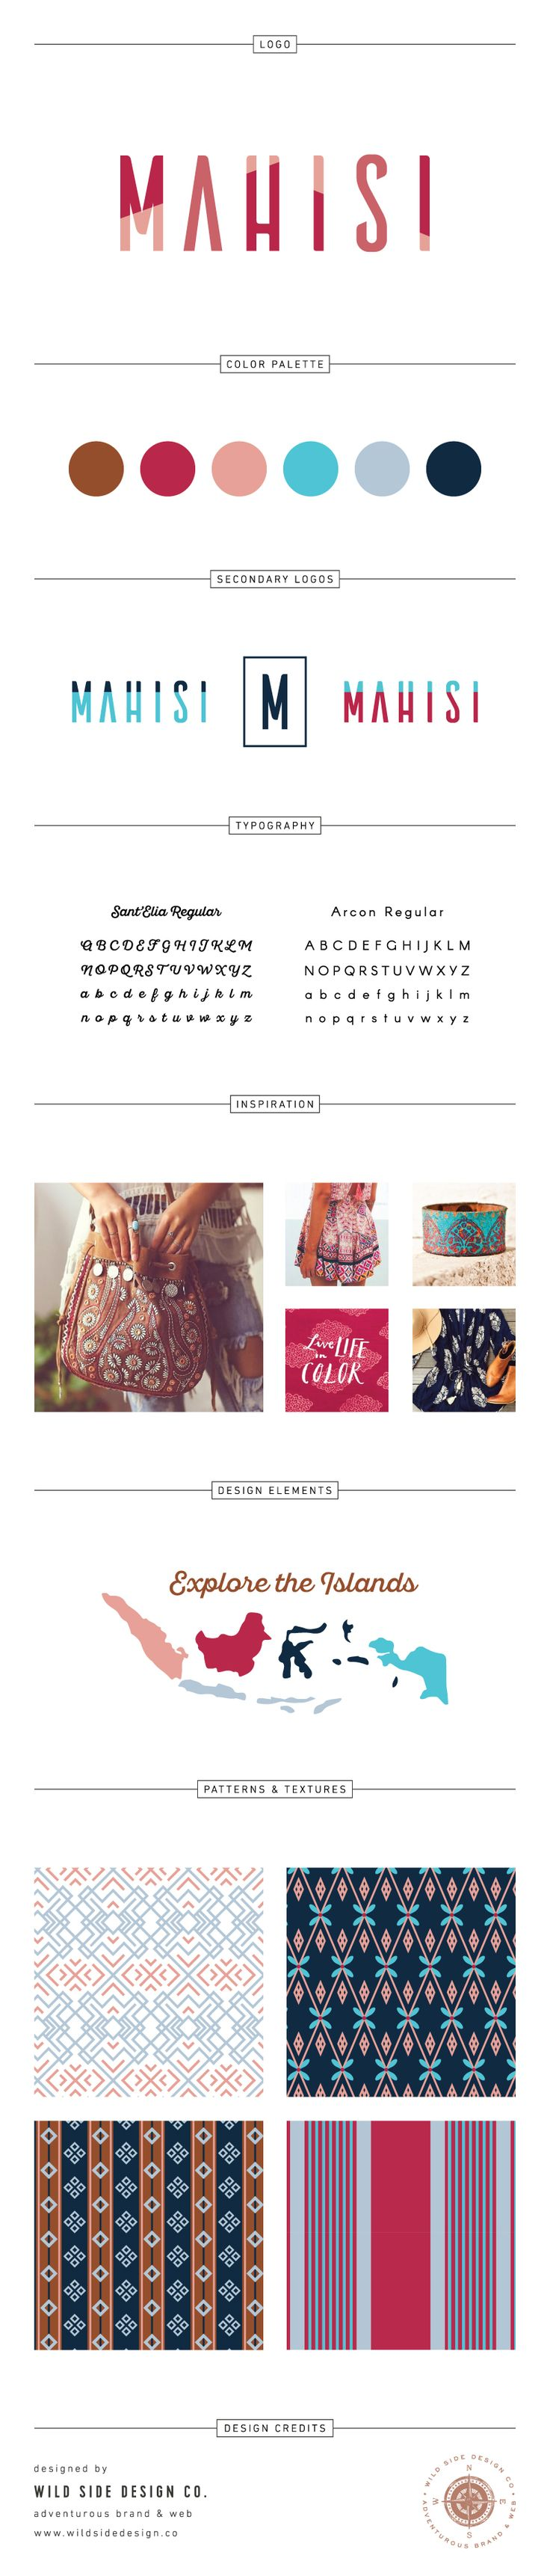 Brand Launch :: Brand Style Board :: Boho Fair Trade Textiles Branding :: Mahisi Brand Design :: #branding www.wildsidedesign.co